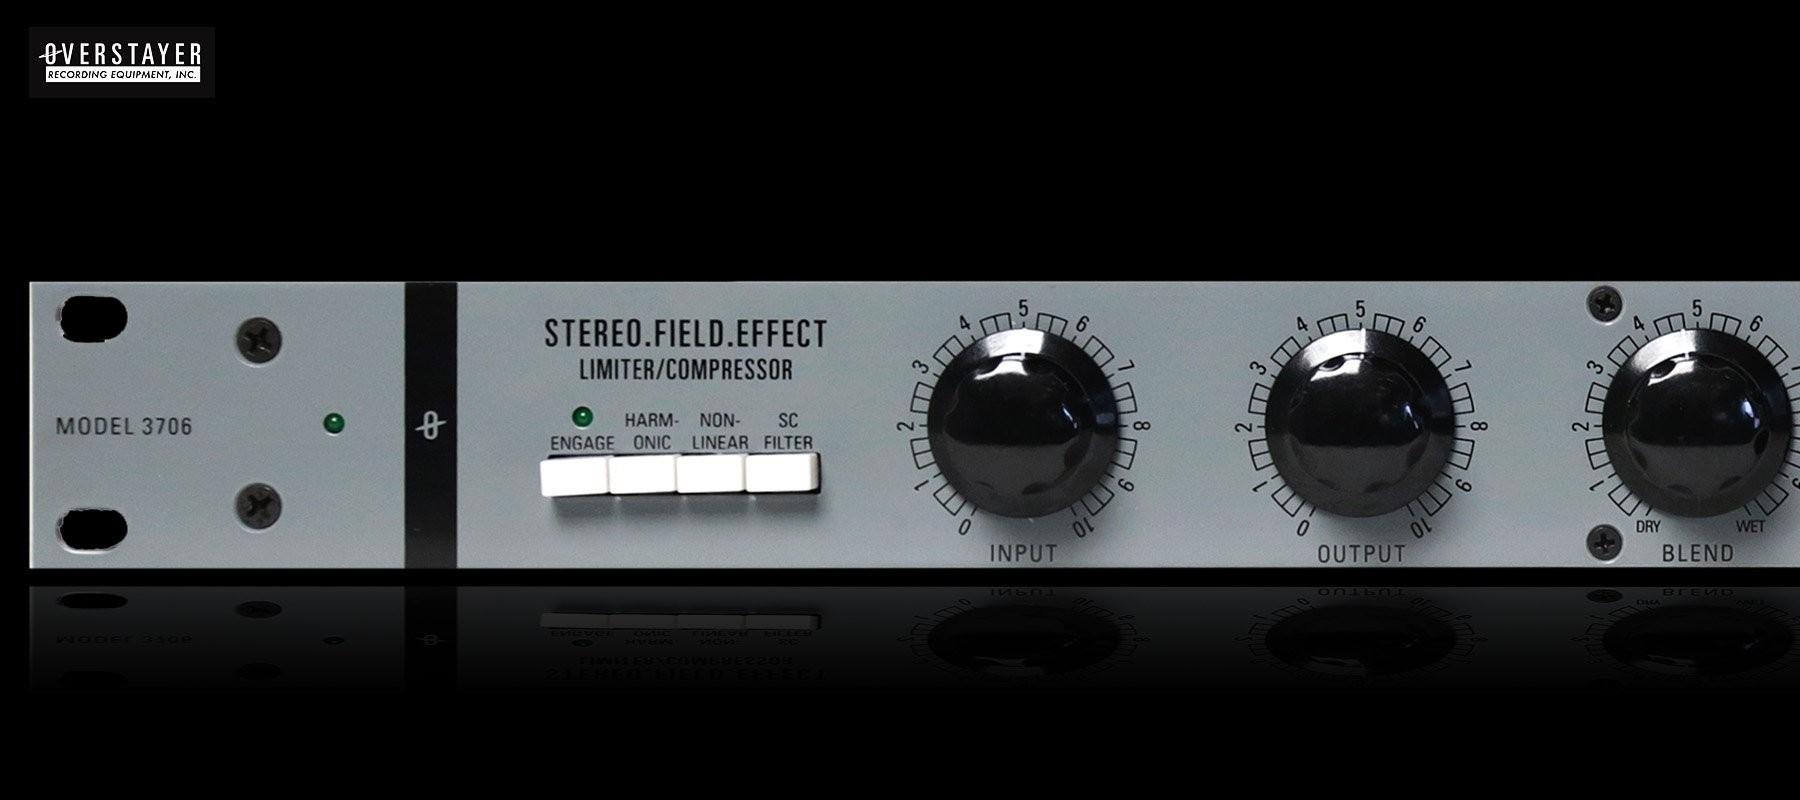 Overstayer Stereo Field Effect 3706